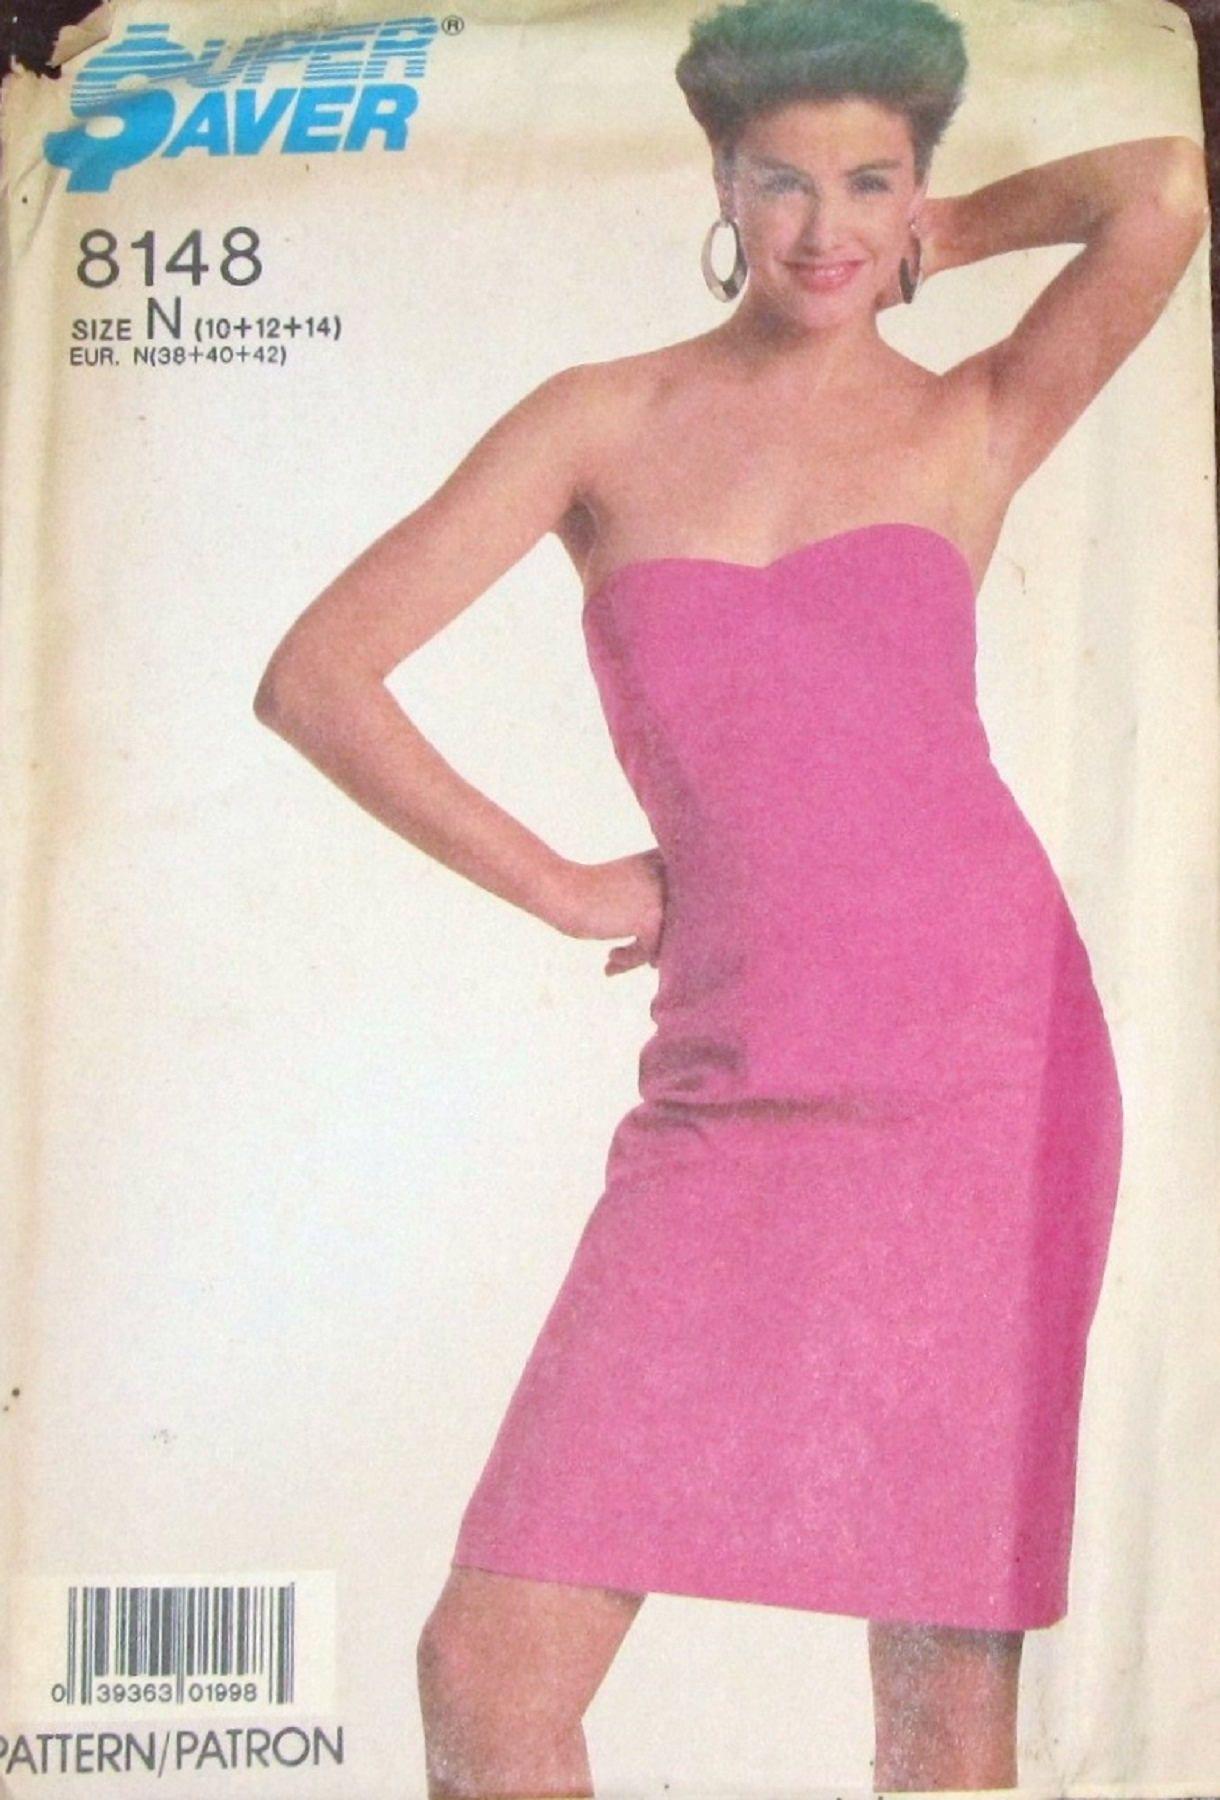 Pin de Rose\'s Patterns Etc on Etsy en Clothing & Fashion Tutorials ...